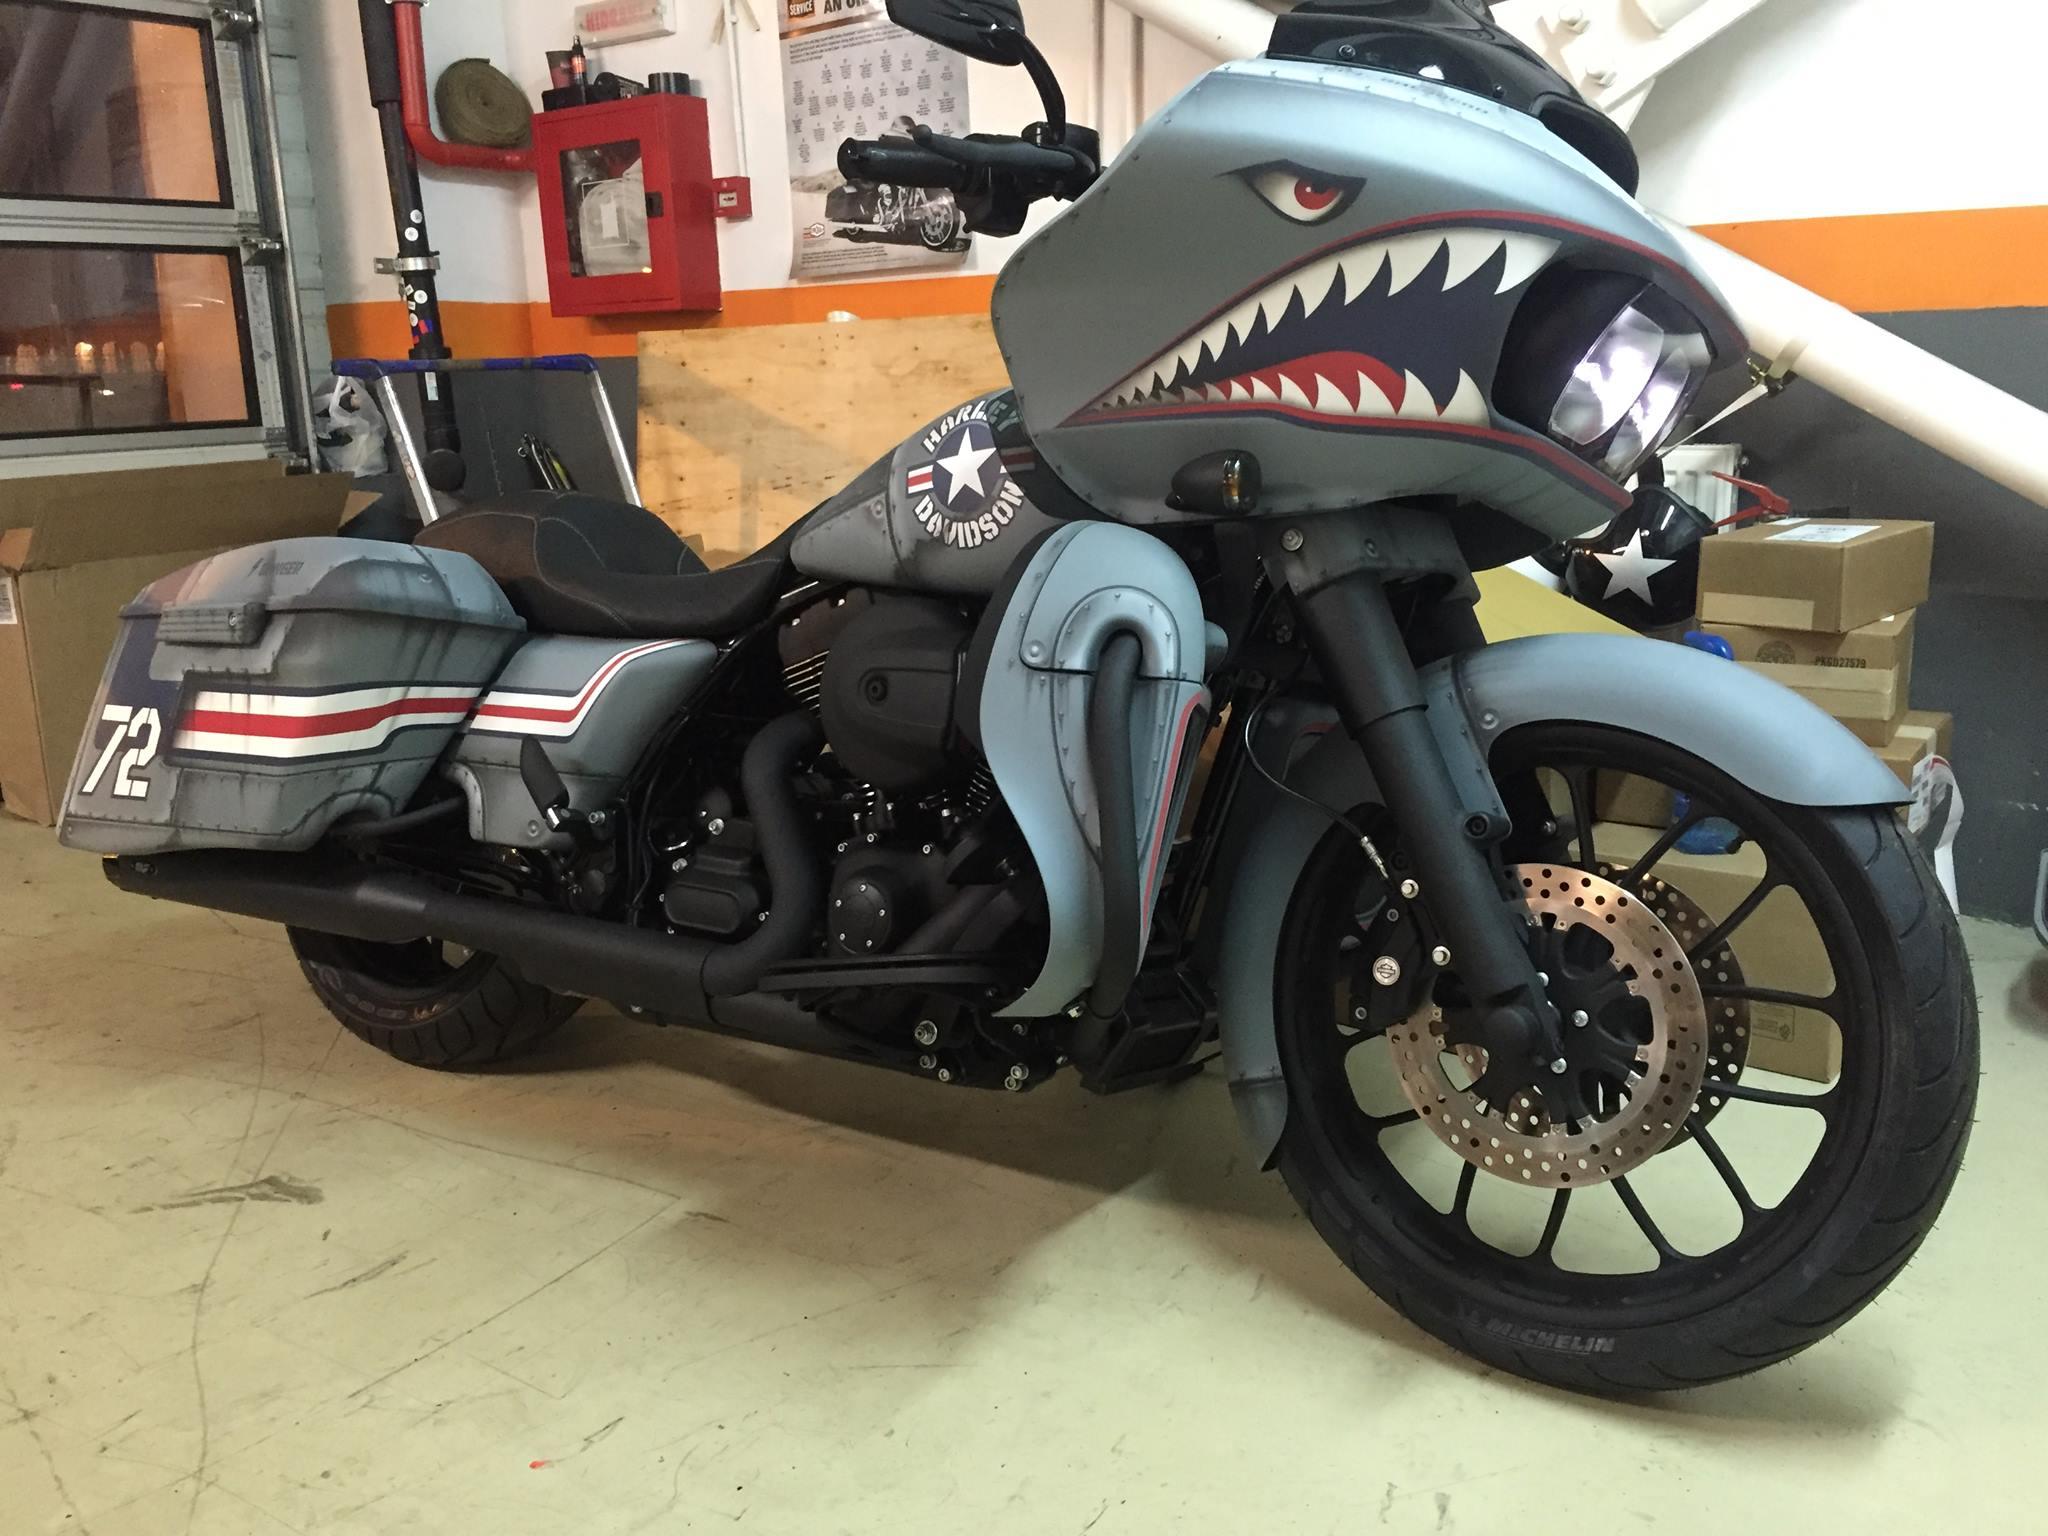 Custom Painted Motorcycle Saddlebags